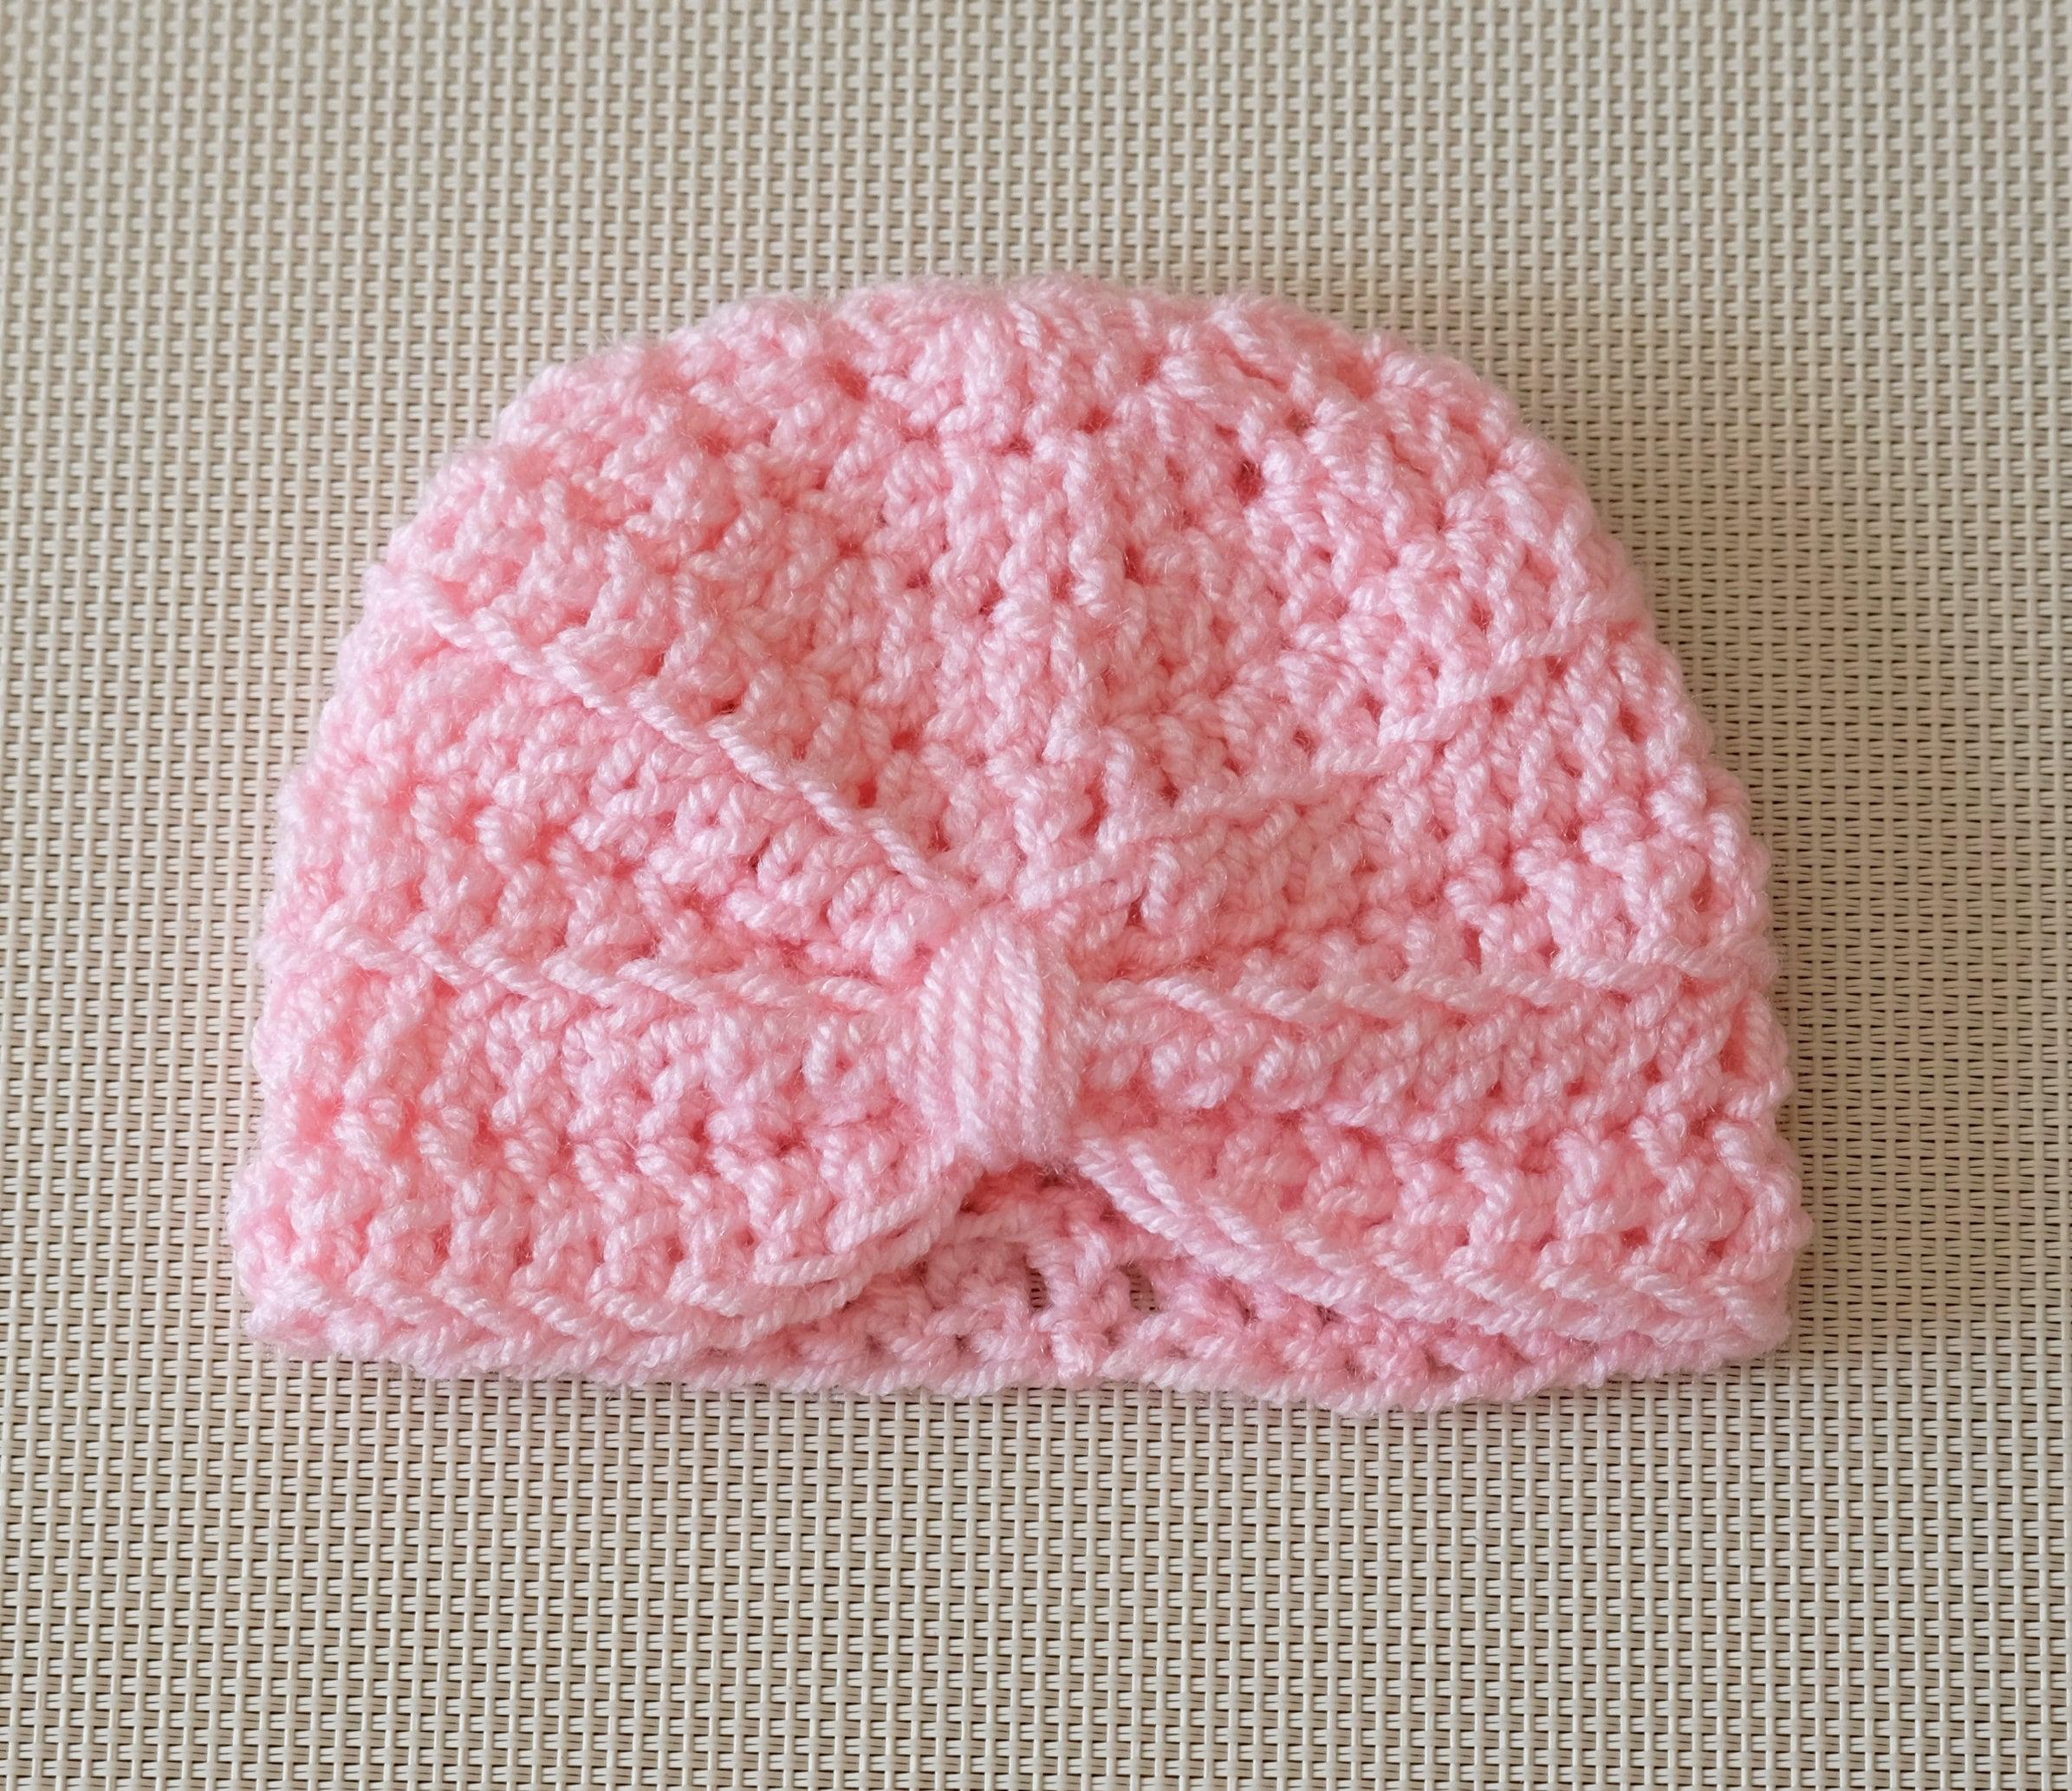 Baby hat Baby girl hat Turban hat Baby turban hat Newborn girl hat Pink turban hat Pink baby girl hat Newborn hat Photo prop